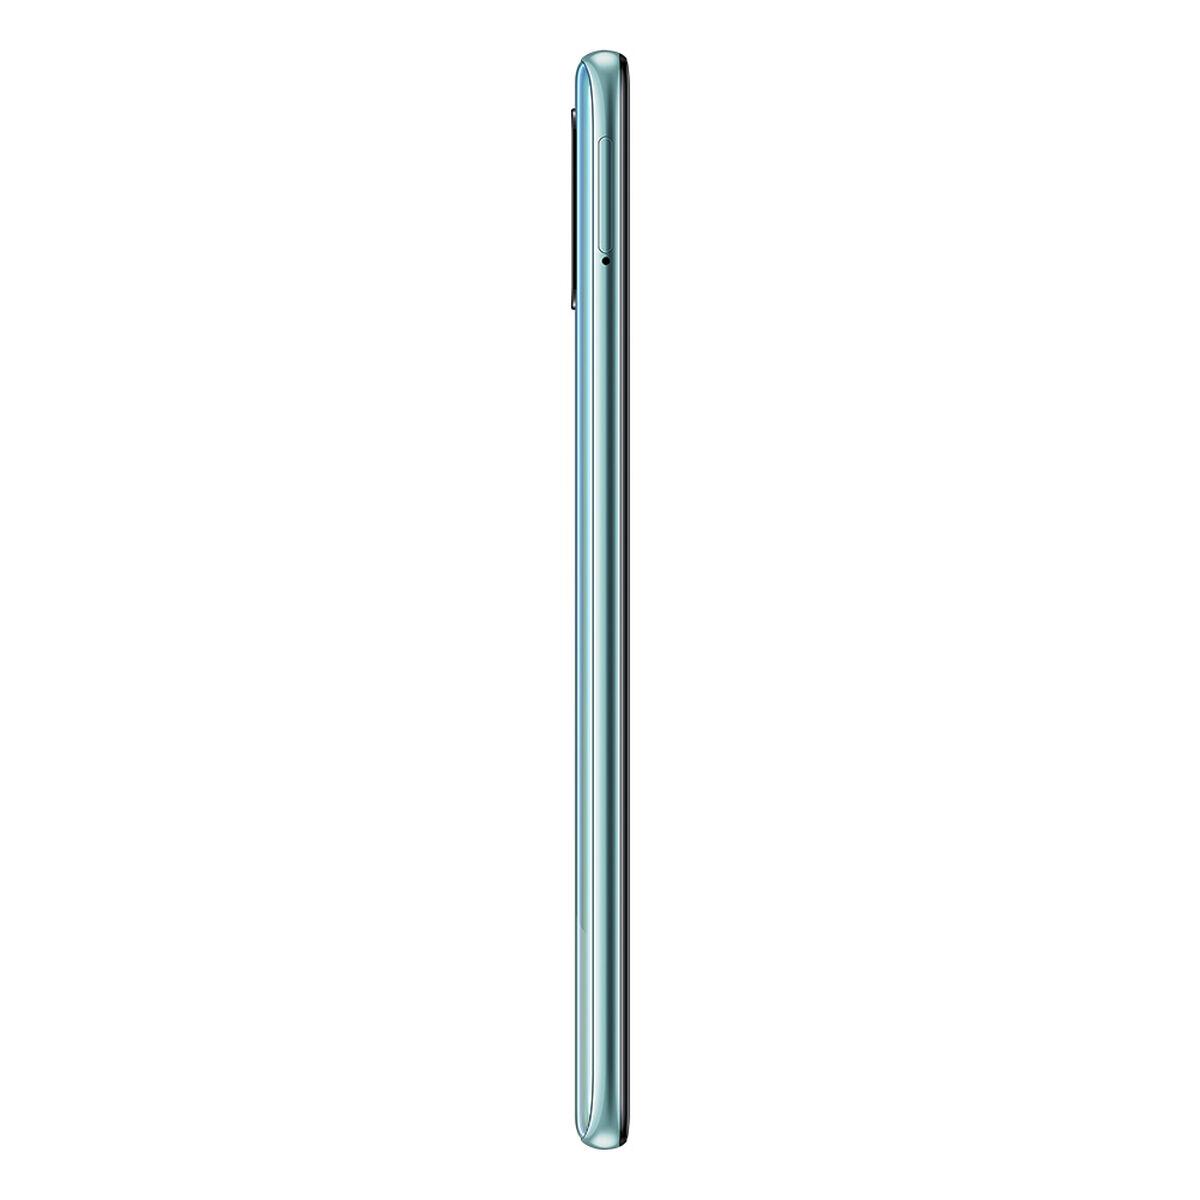 "Celular Samsung Galaxy A51 128GB 6.5"" Azul Liberado"